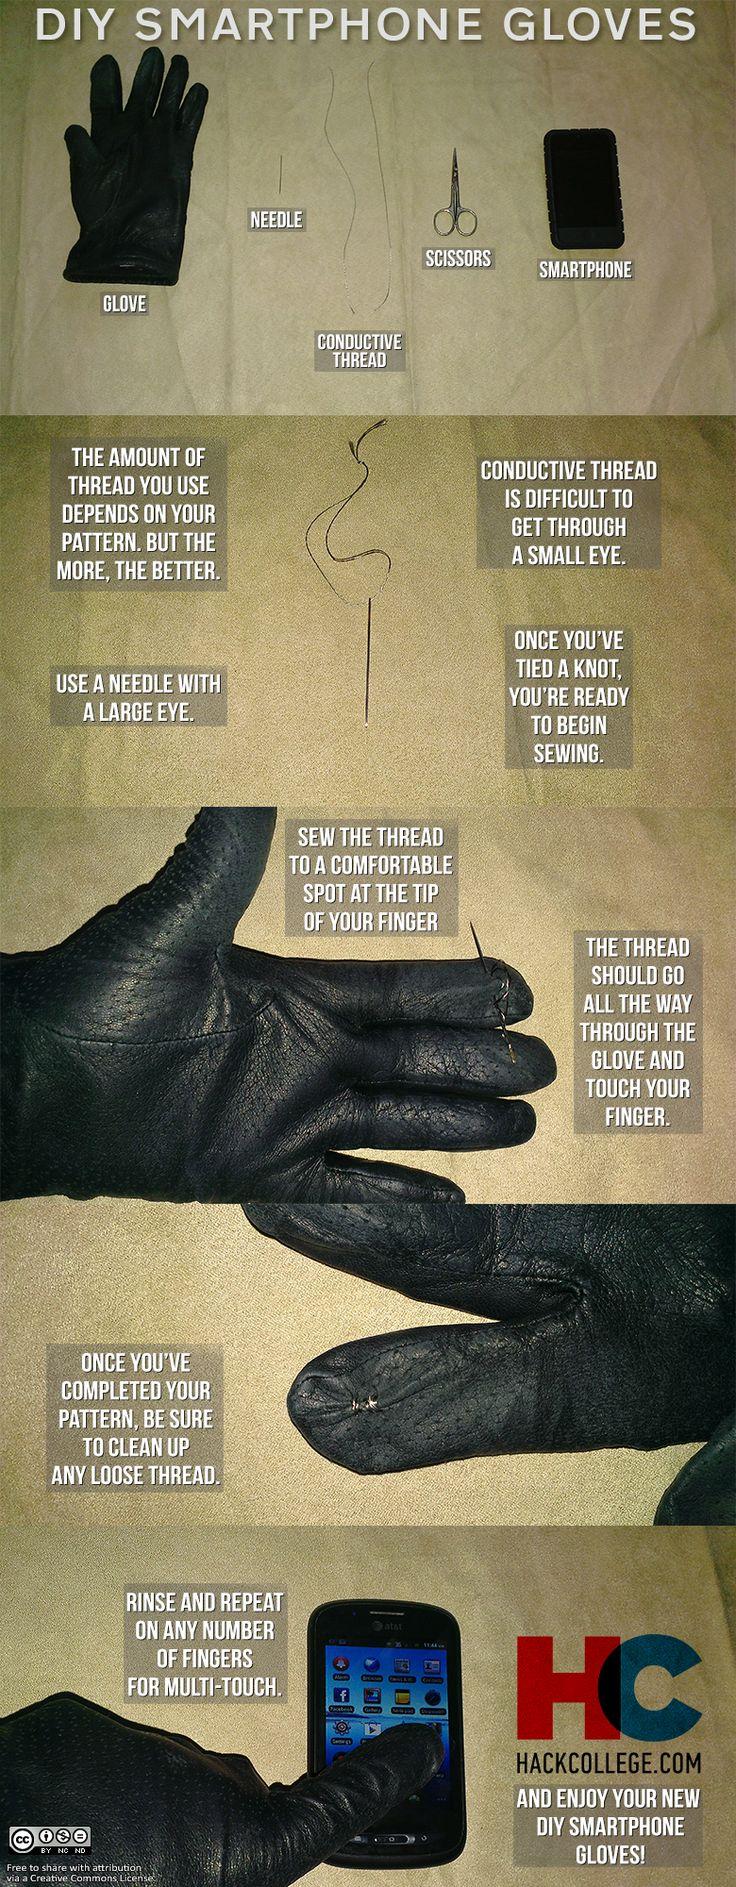 DIY Smartphone Gloves